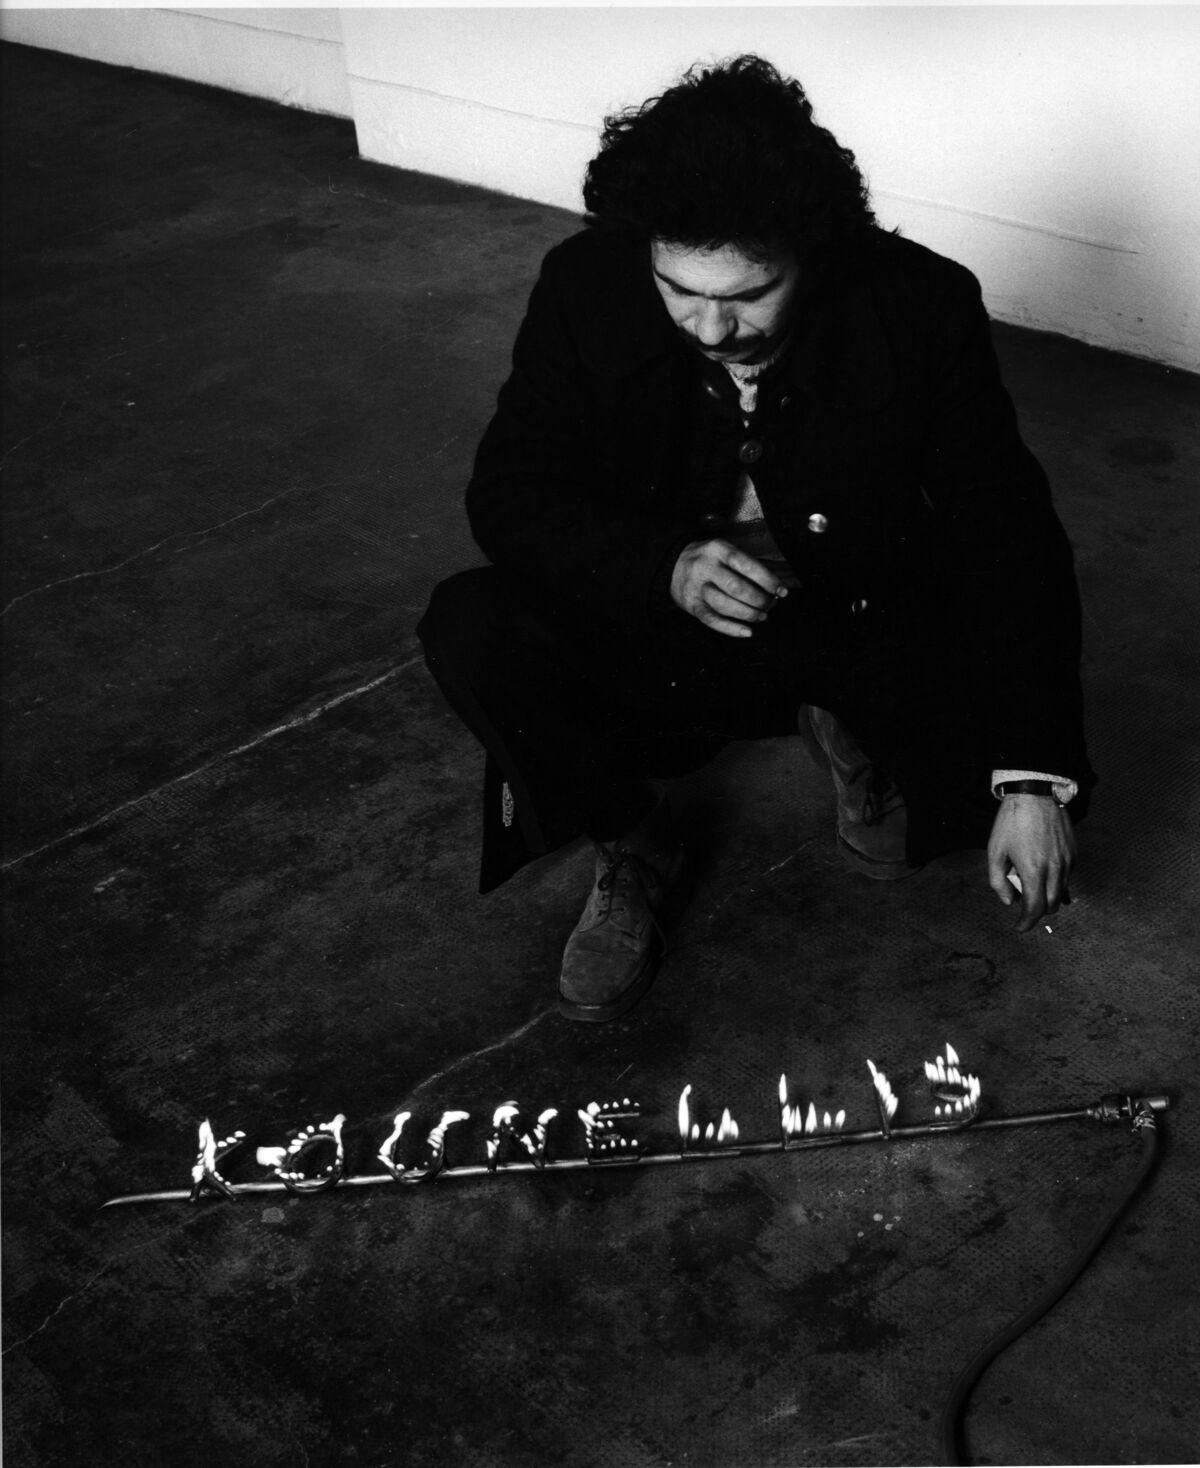 Portrait of Jannis Kounellis, Galleria Gian Enzo Sperone, Turin, 1971. Photo © Paolo Mussat Sartor. Courtesy of Fondazione Prada.